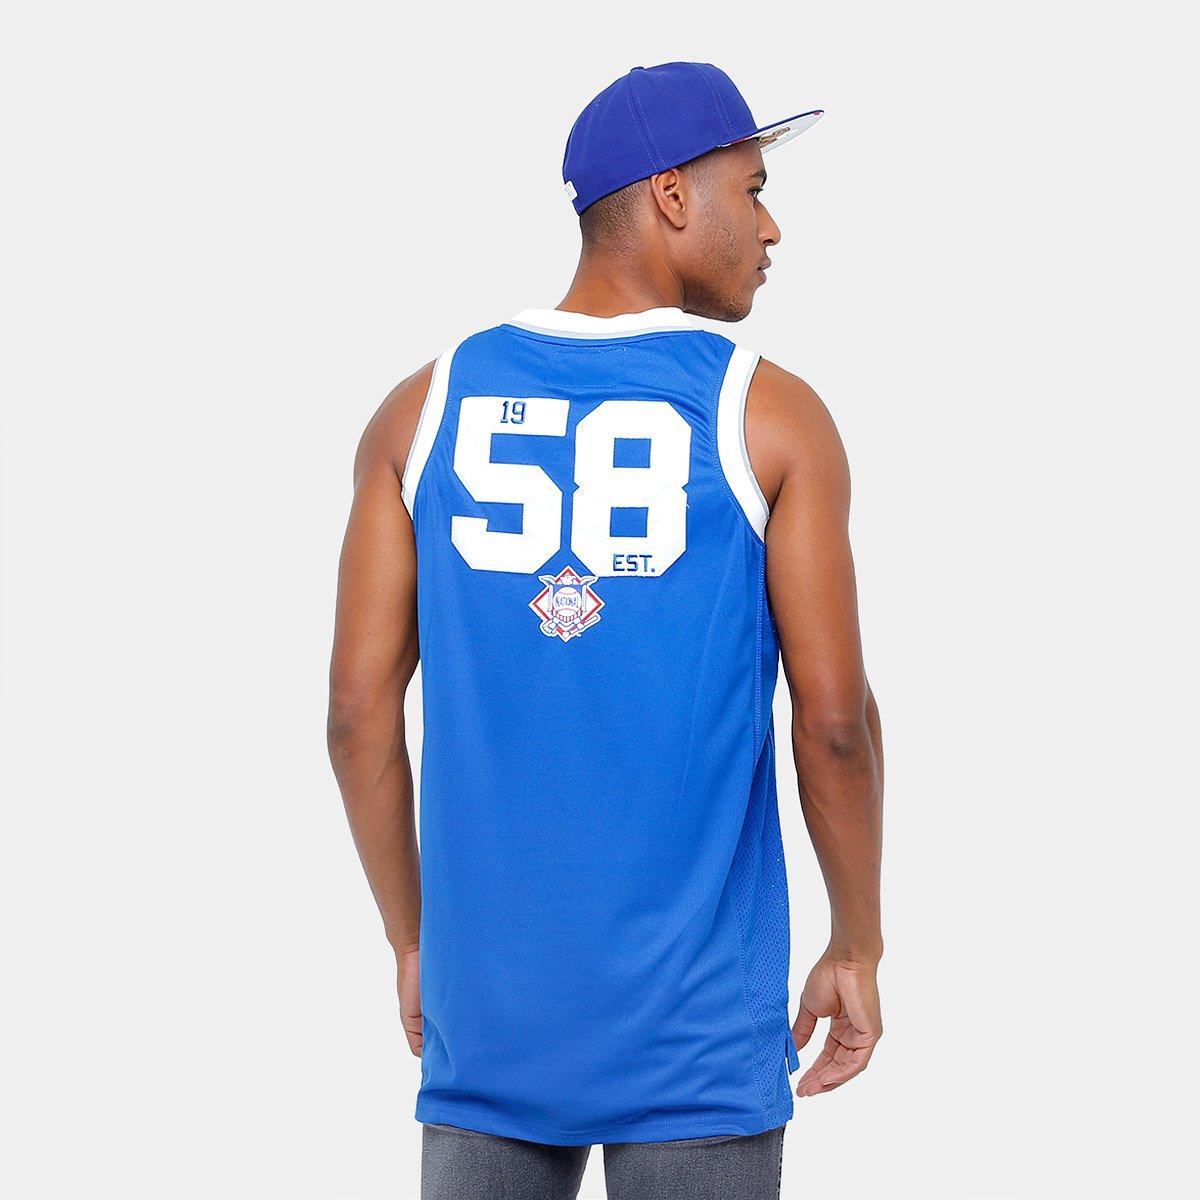 Camiseta Regata New Era MLB Basketball Los Angeles Dodgers - Compre ... 96dd02d6c50